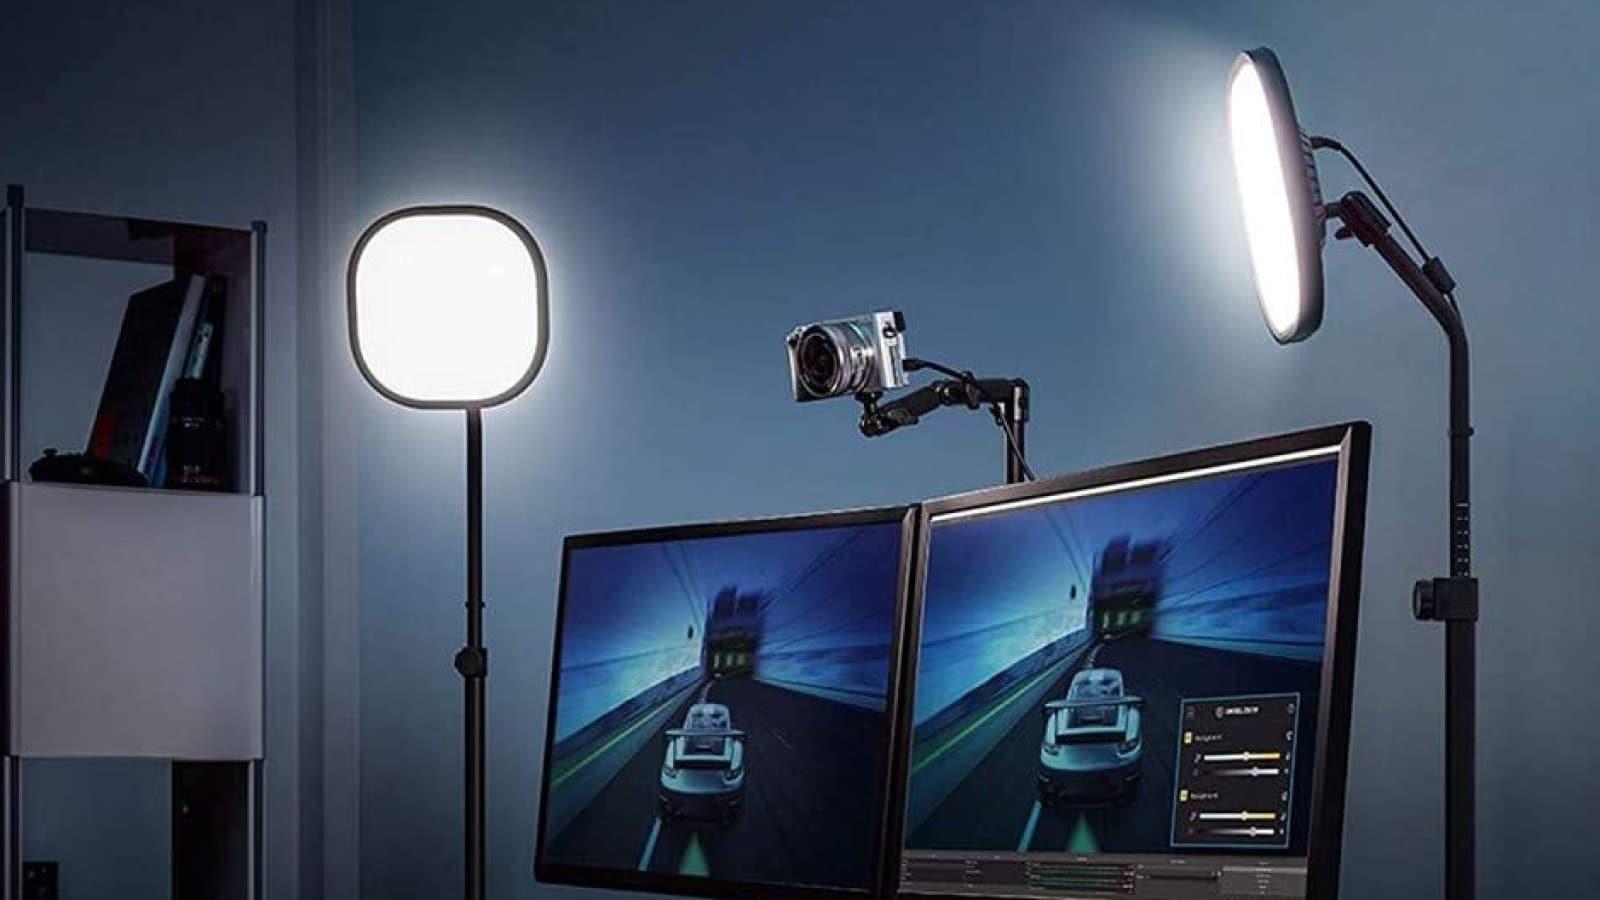 elgato key light air lights in use on desktop